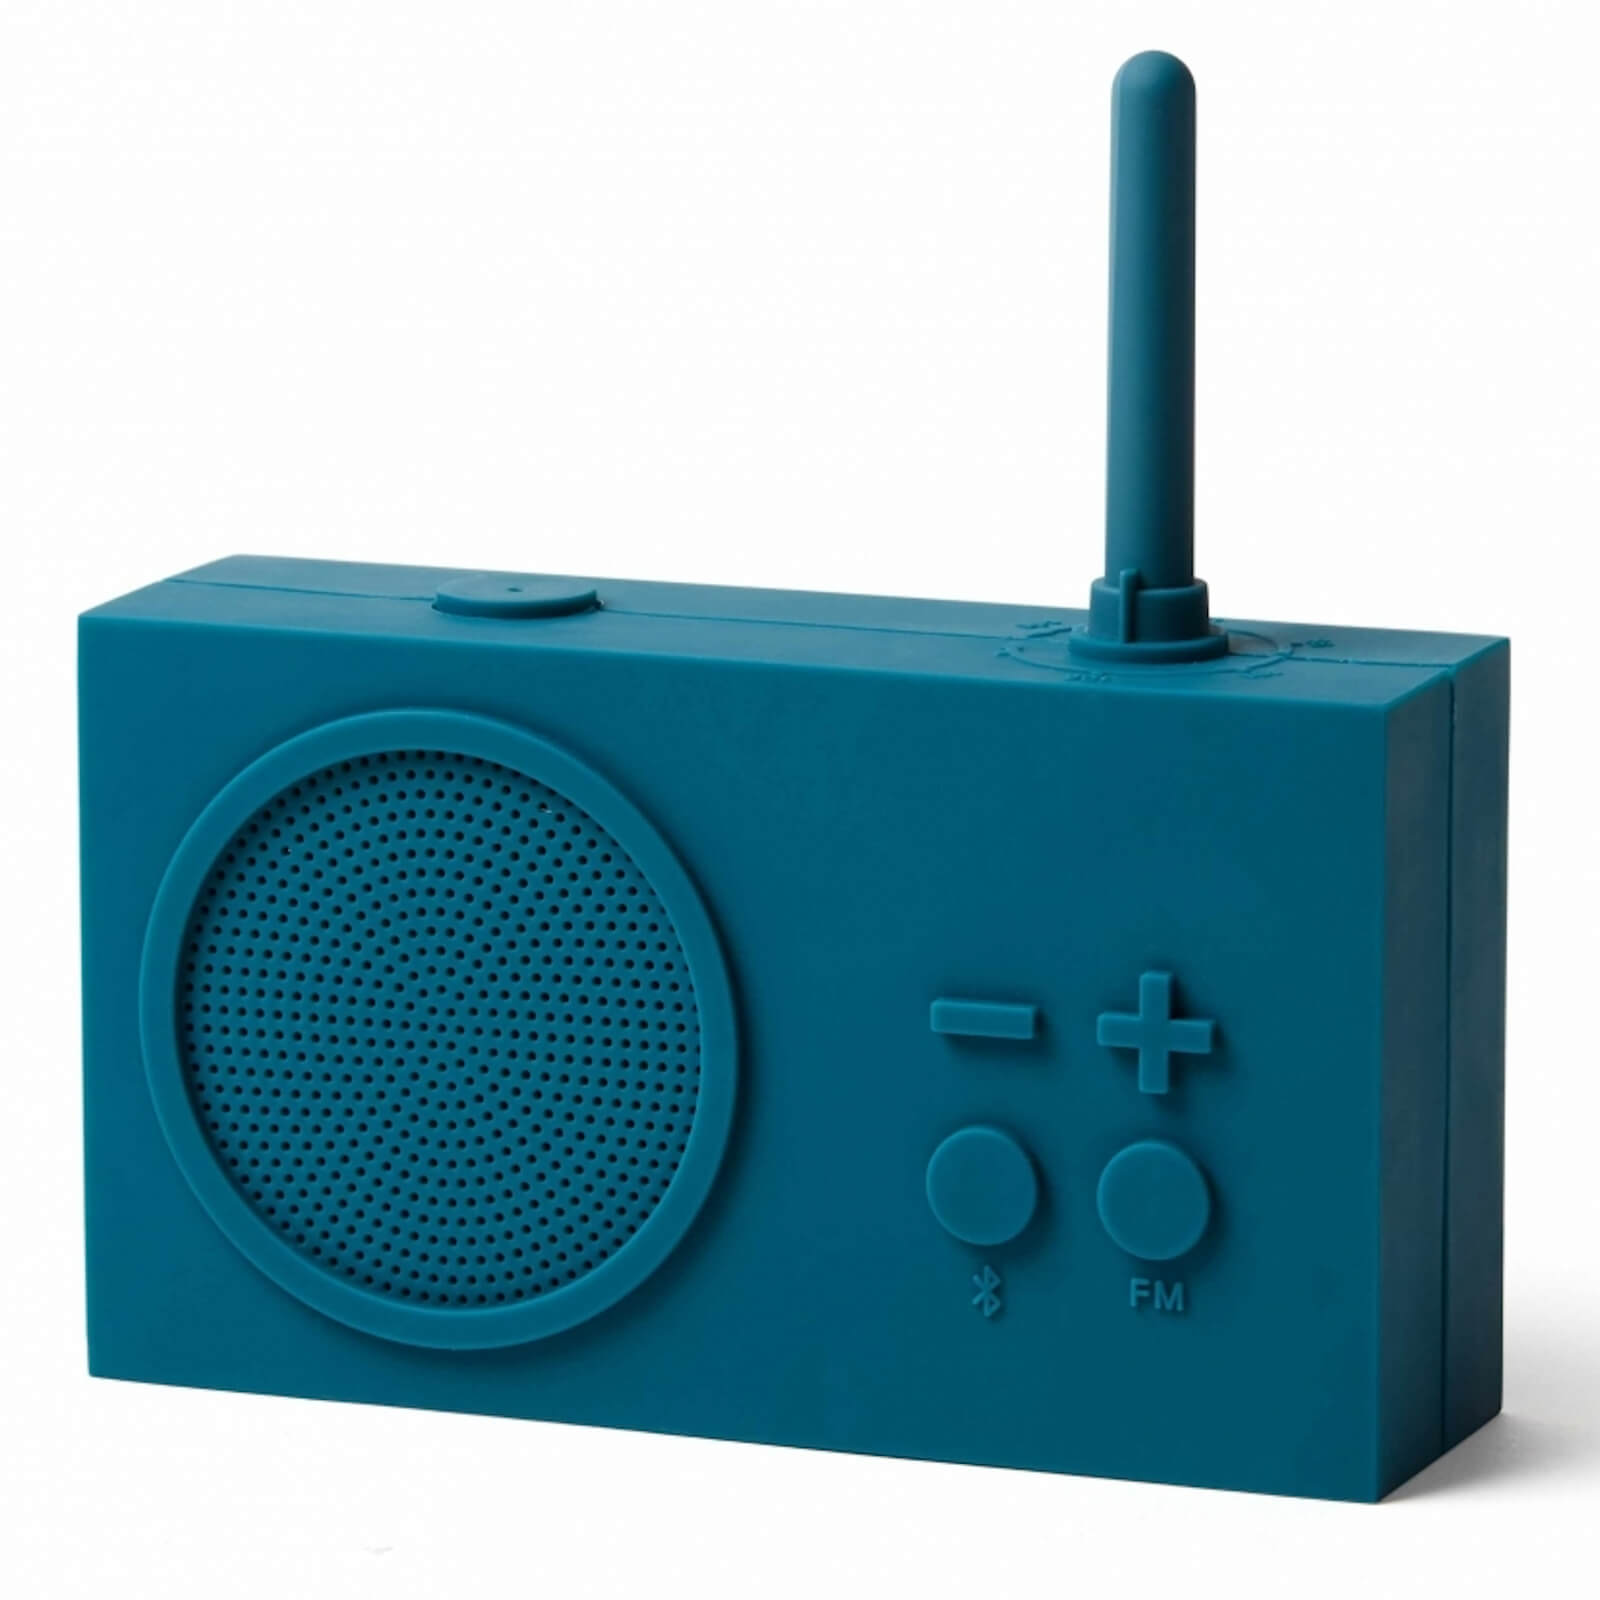 Lexon TYKHO 3 FM Radio and Bluetooth Speaker - Duck Blue